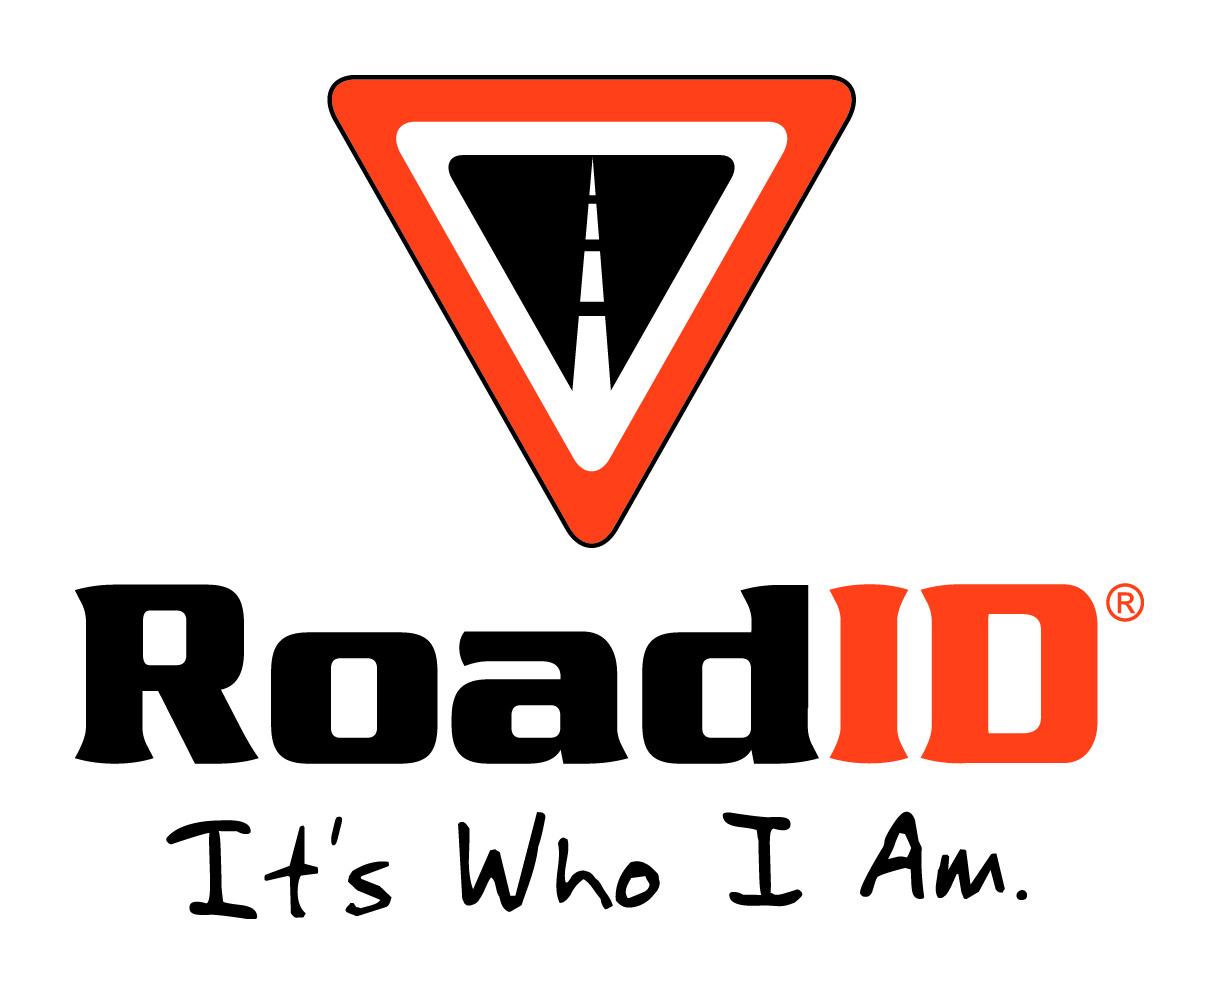 Road ID